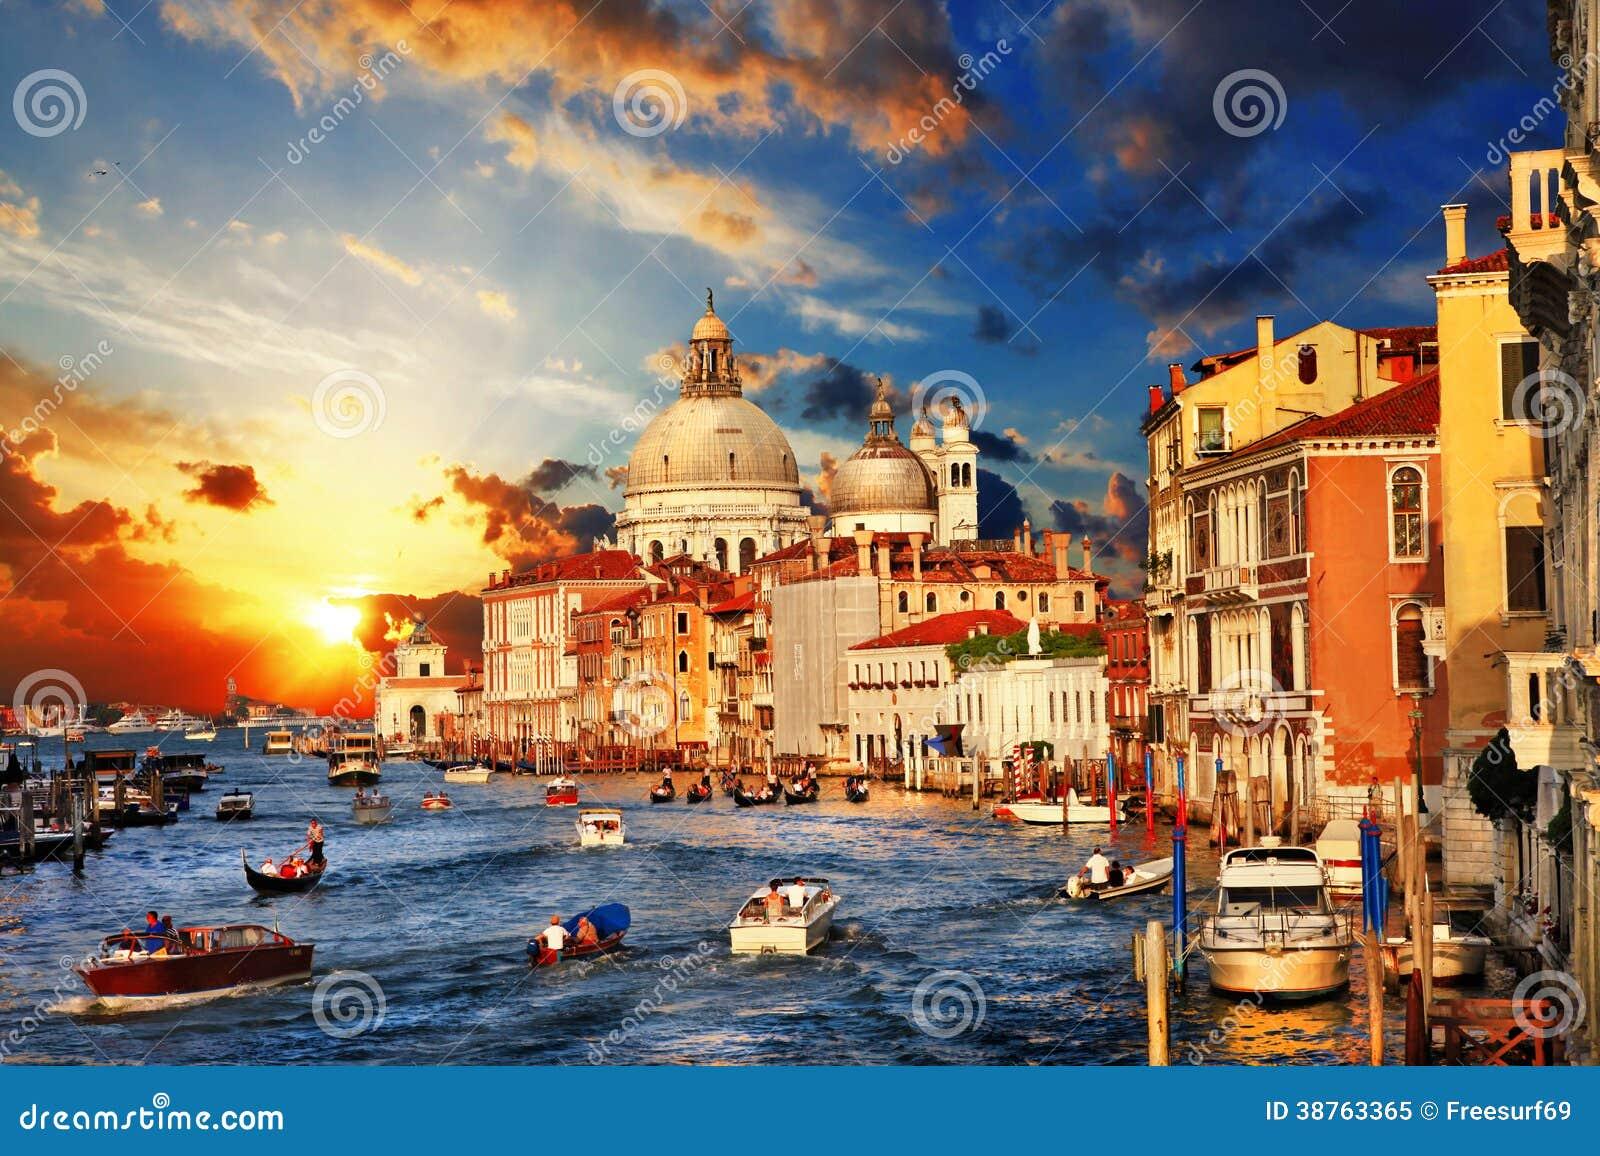 Venice on sunset